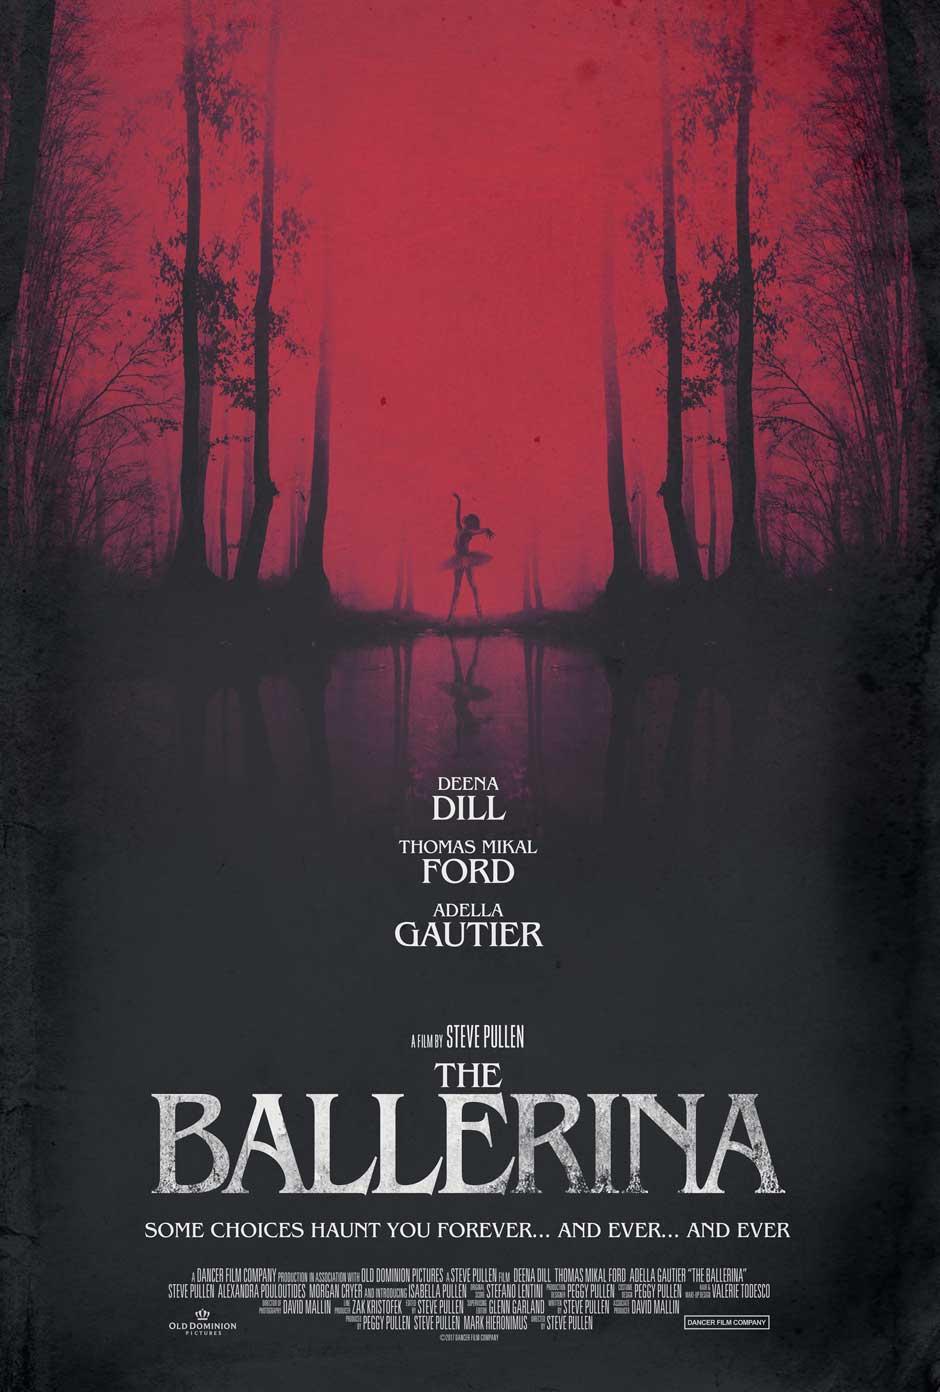 a ballerinas tale full movie greek subs